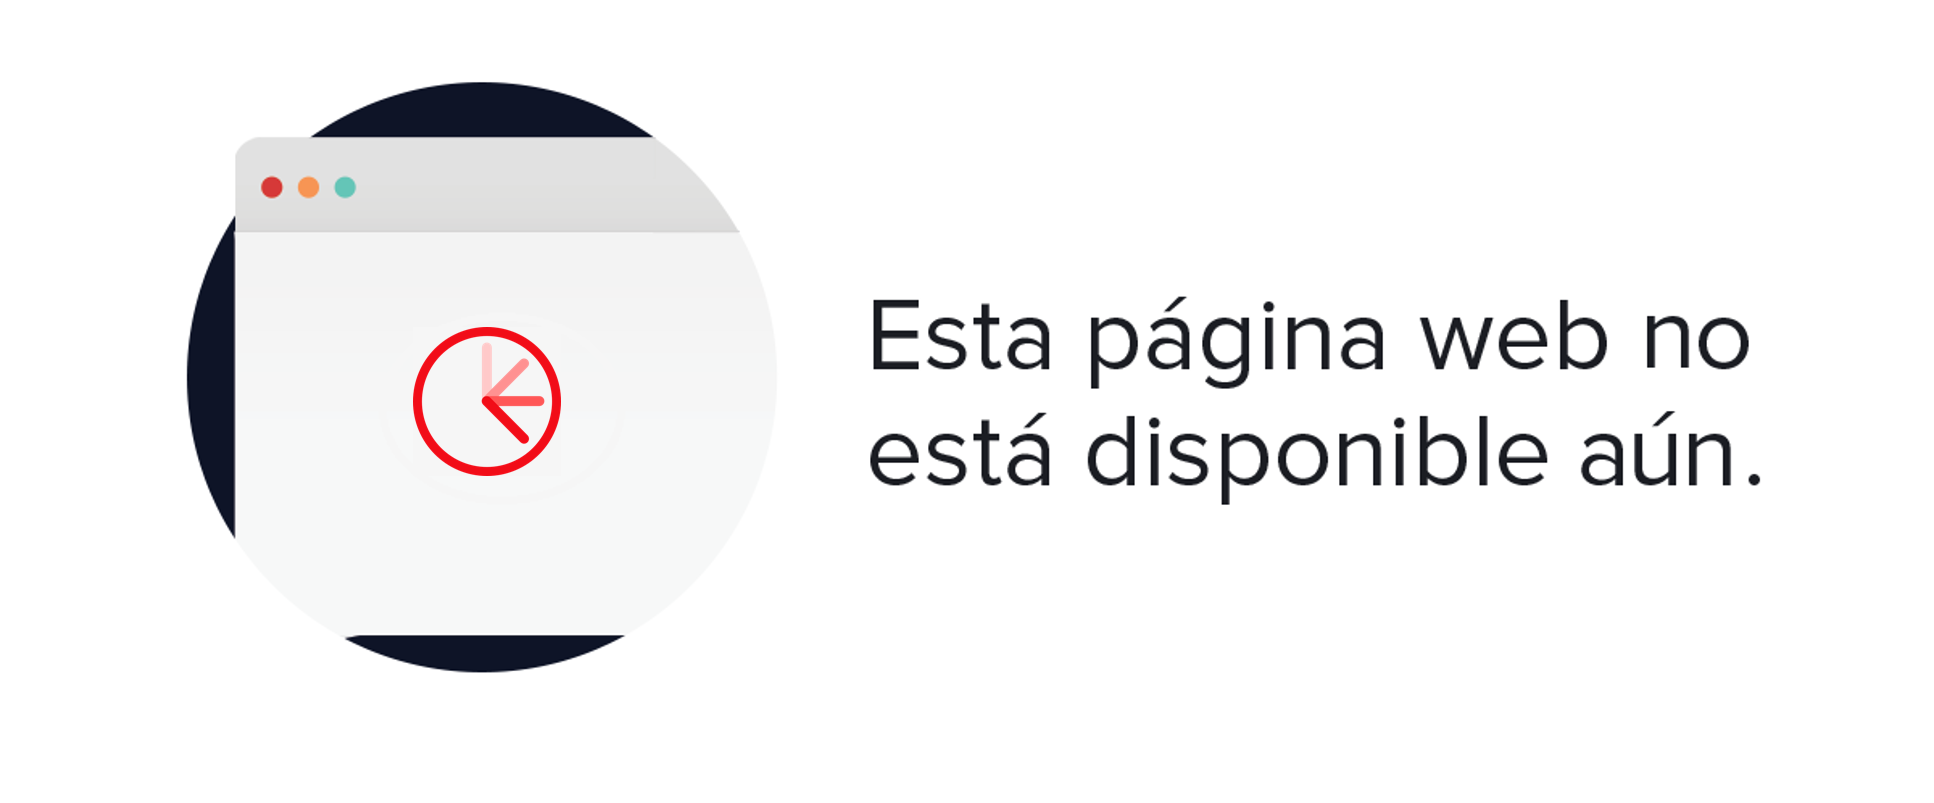 Bolsas de Papel Personalizadas con Asa Rizada Medidas 41+12x36 cm 120gr